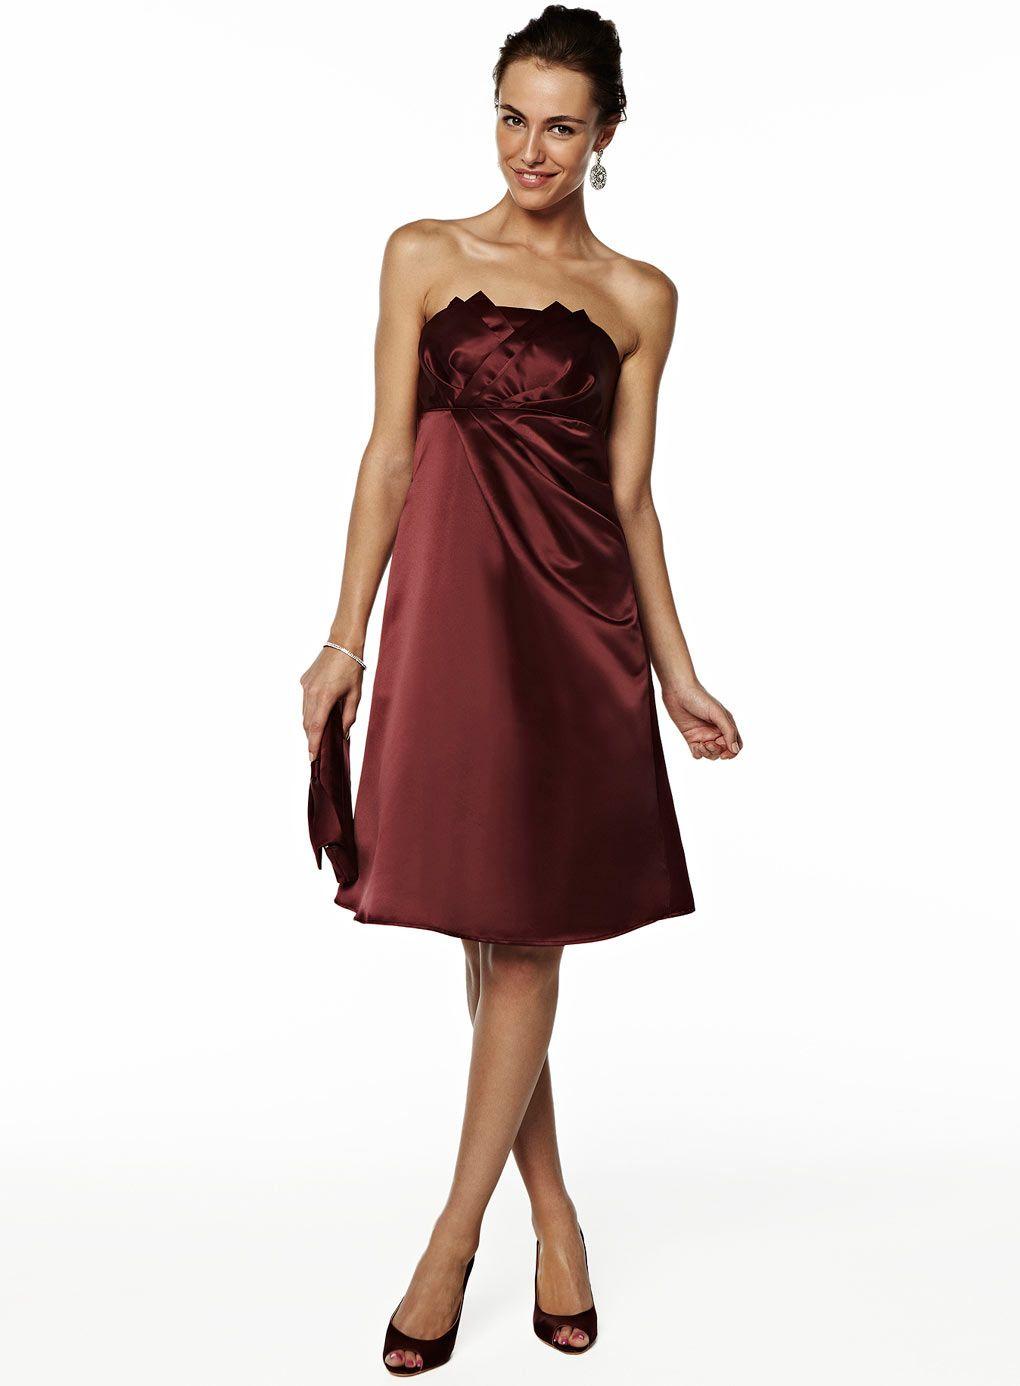 Iris merlot short dress httpweddingheartbhs adult iris merlot short dress httpweddingheart ombrellifo Choice Image